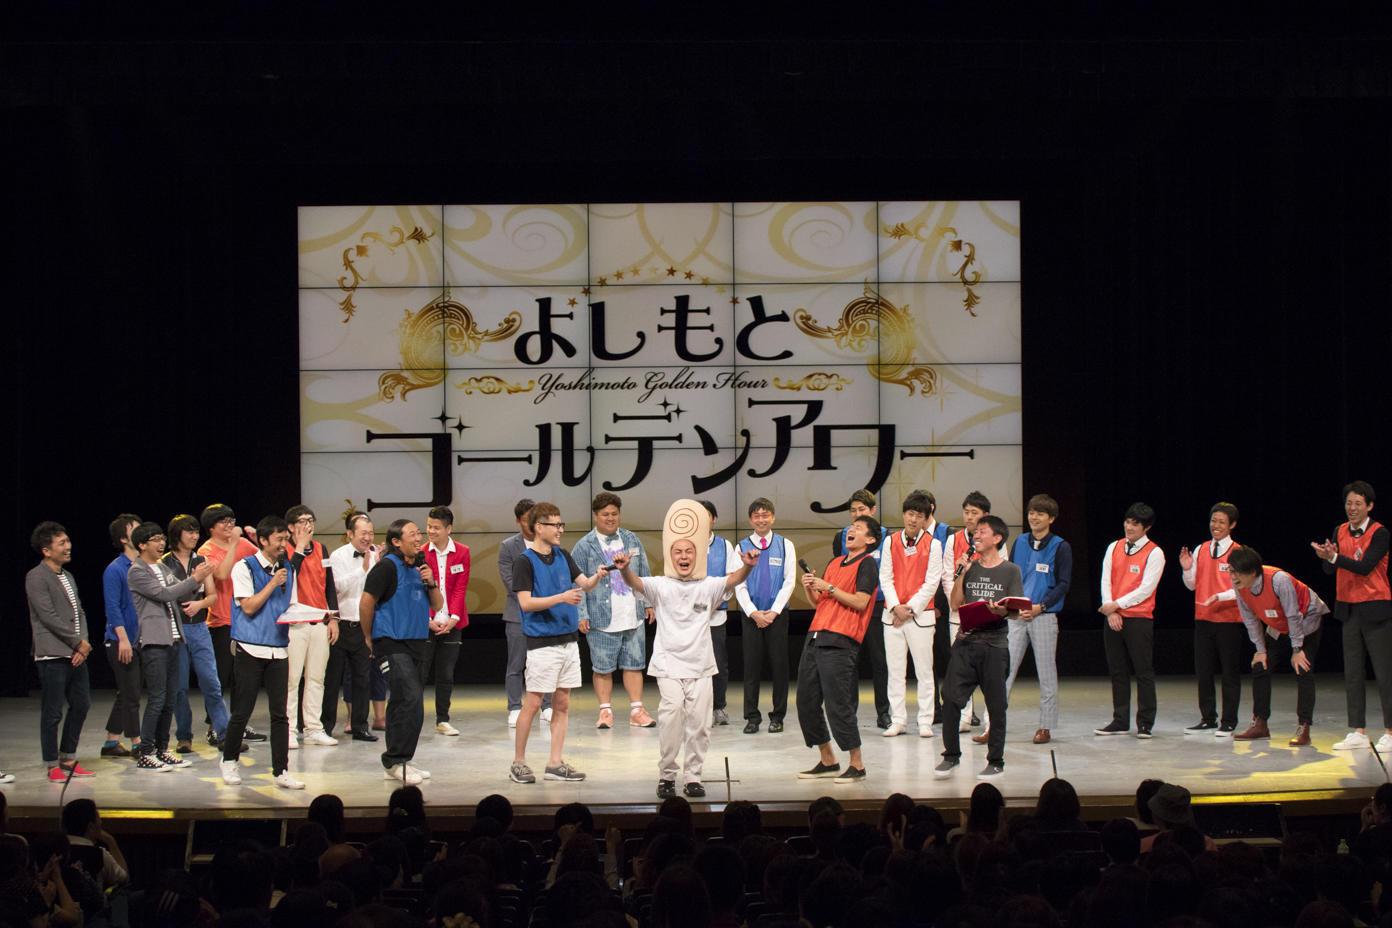 http://news.yoshimoto.co.jp/20160824231935-621f84c679b38c546362186ea4adcbb2754274a5.jpg